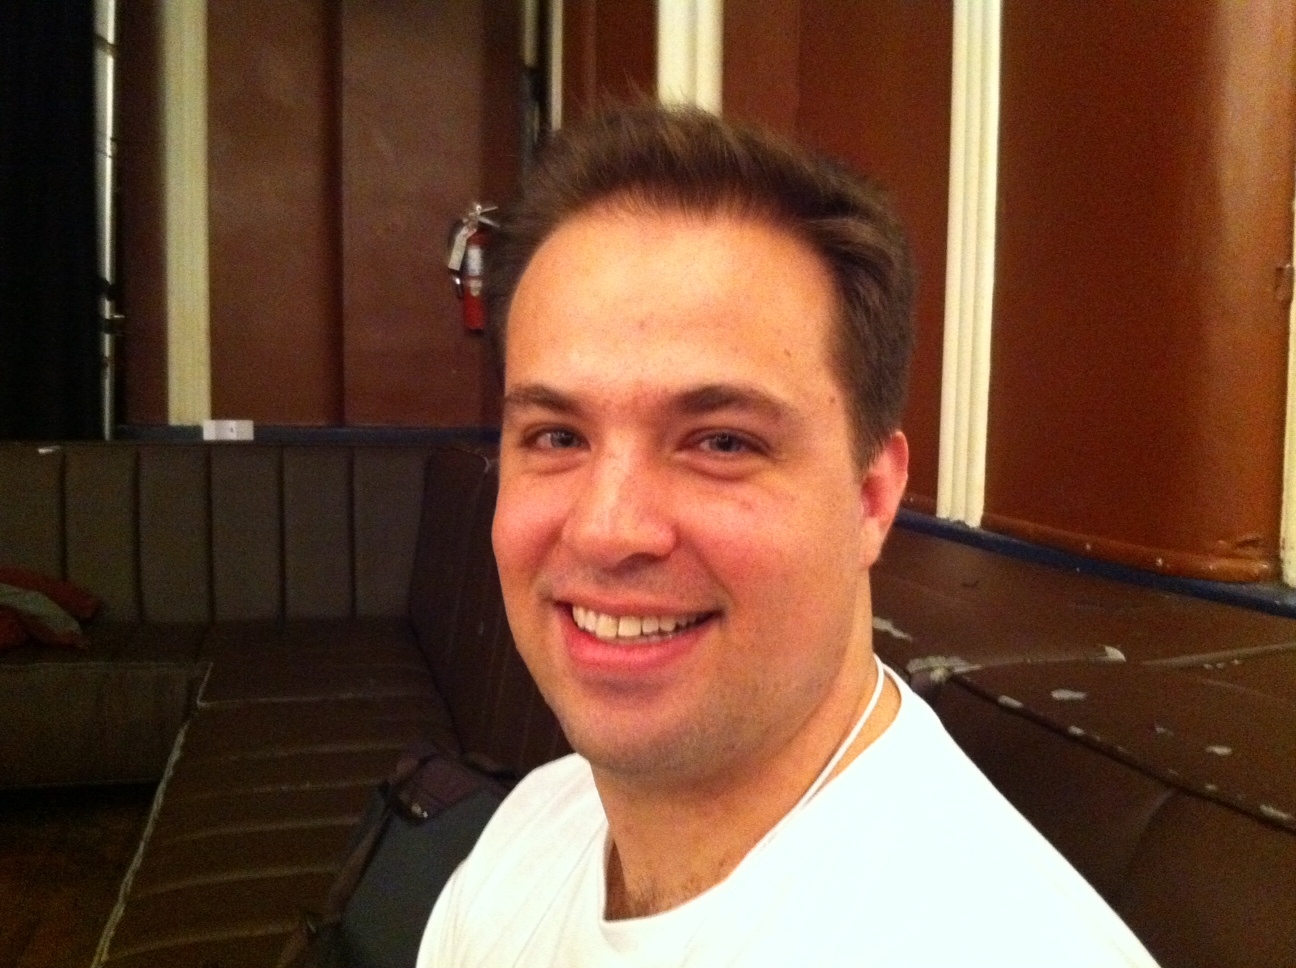 Thinknear CEO and Founder Eli Portnoy